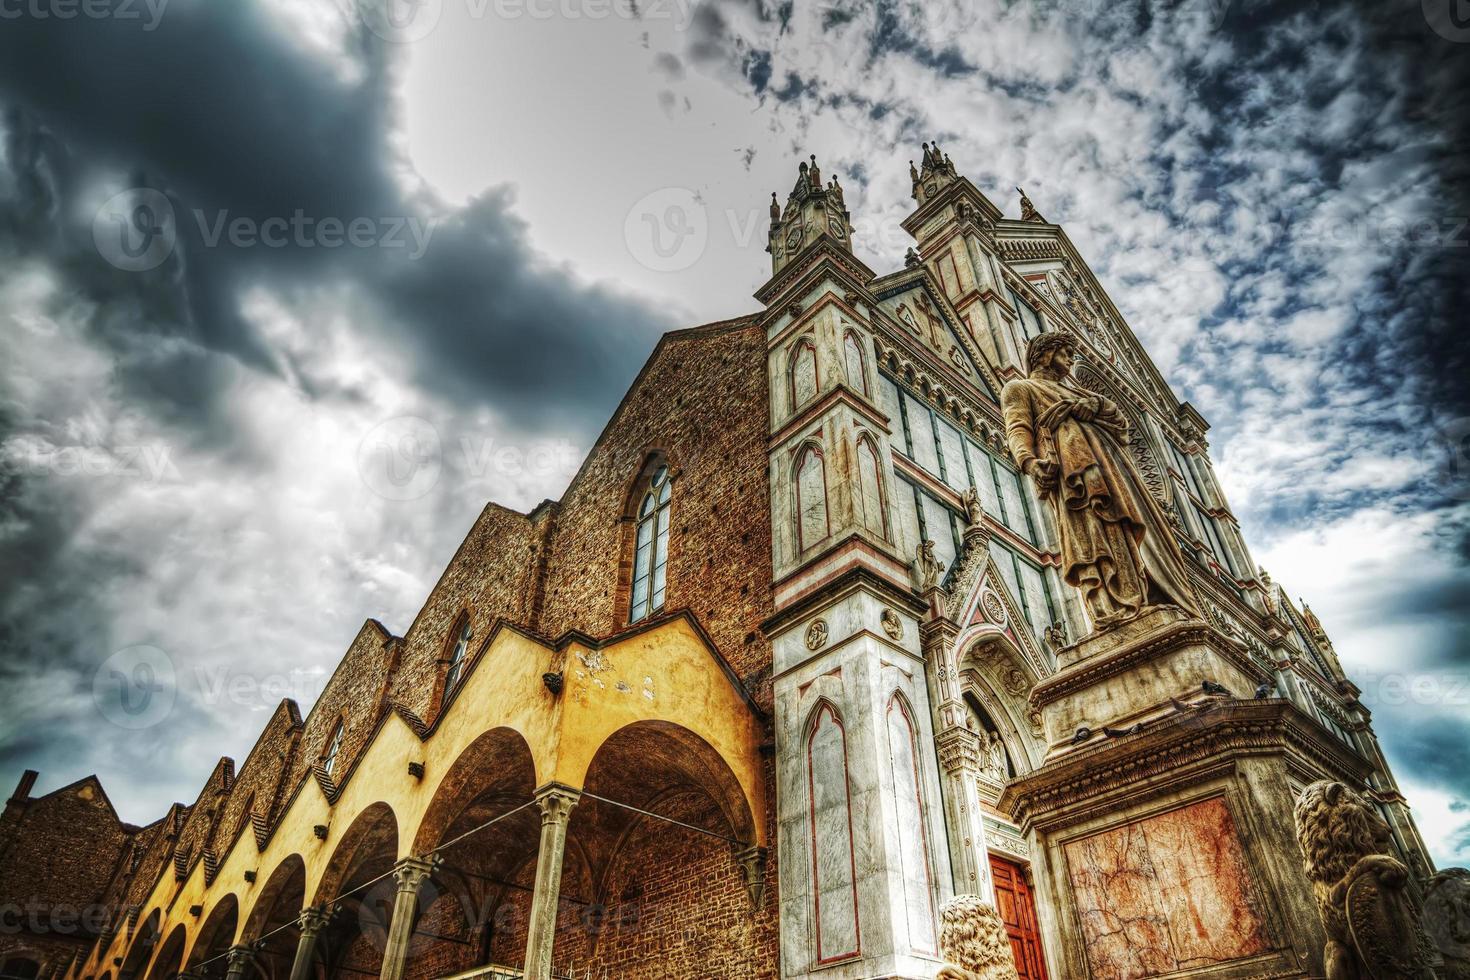 santa croce katedral i hdr-tonmappning foto